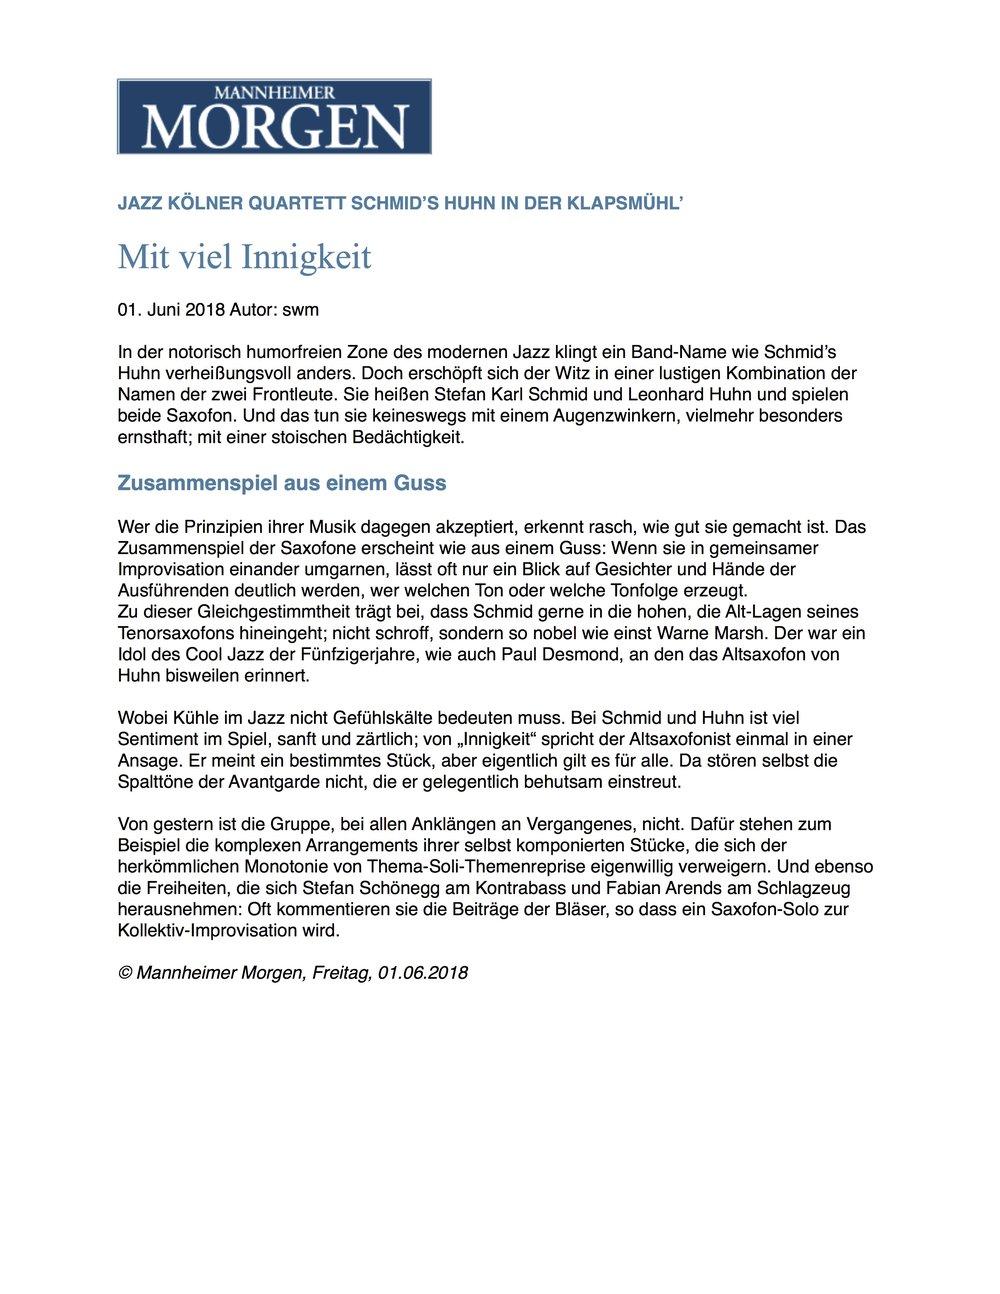 20180531 - Mannheimer Morgen Rezension Klapsmühl.jpg